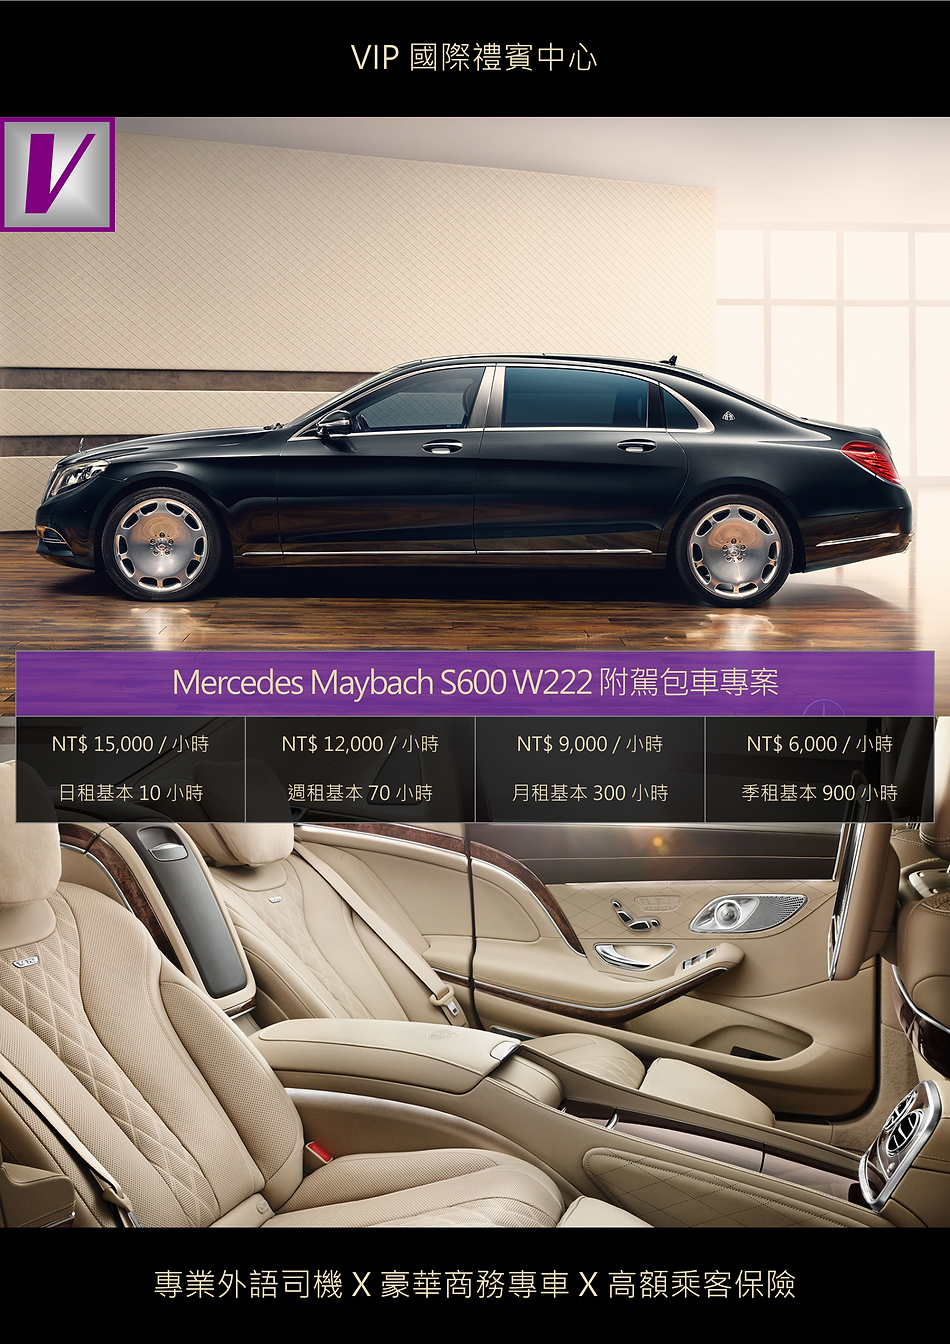 VIP國際禮賓中心 MERCEDES MAYBACH S600 W222 附駕包車專案 DM.png